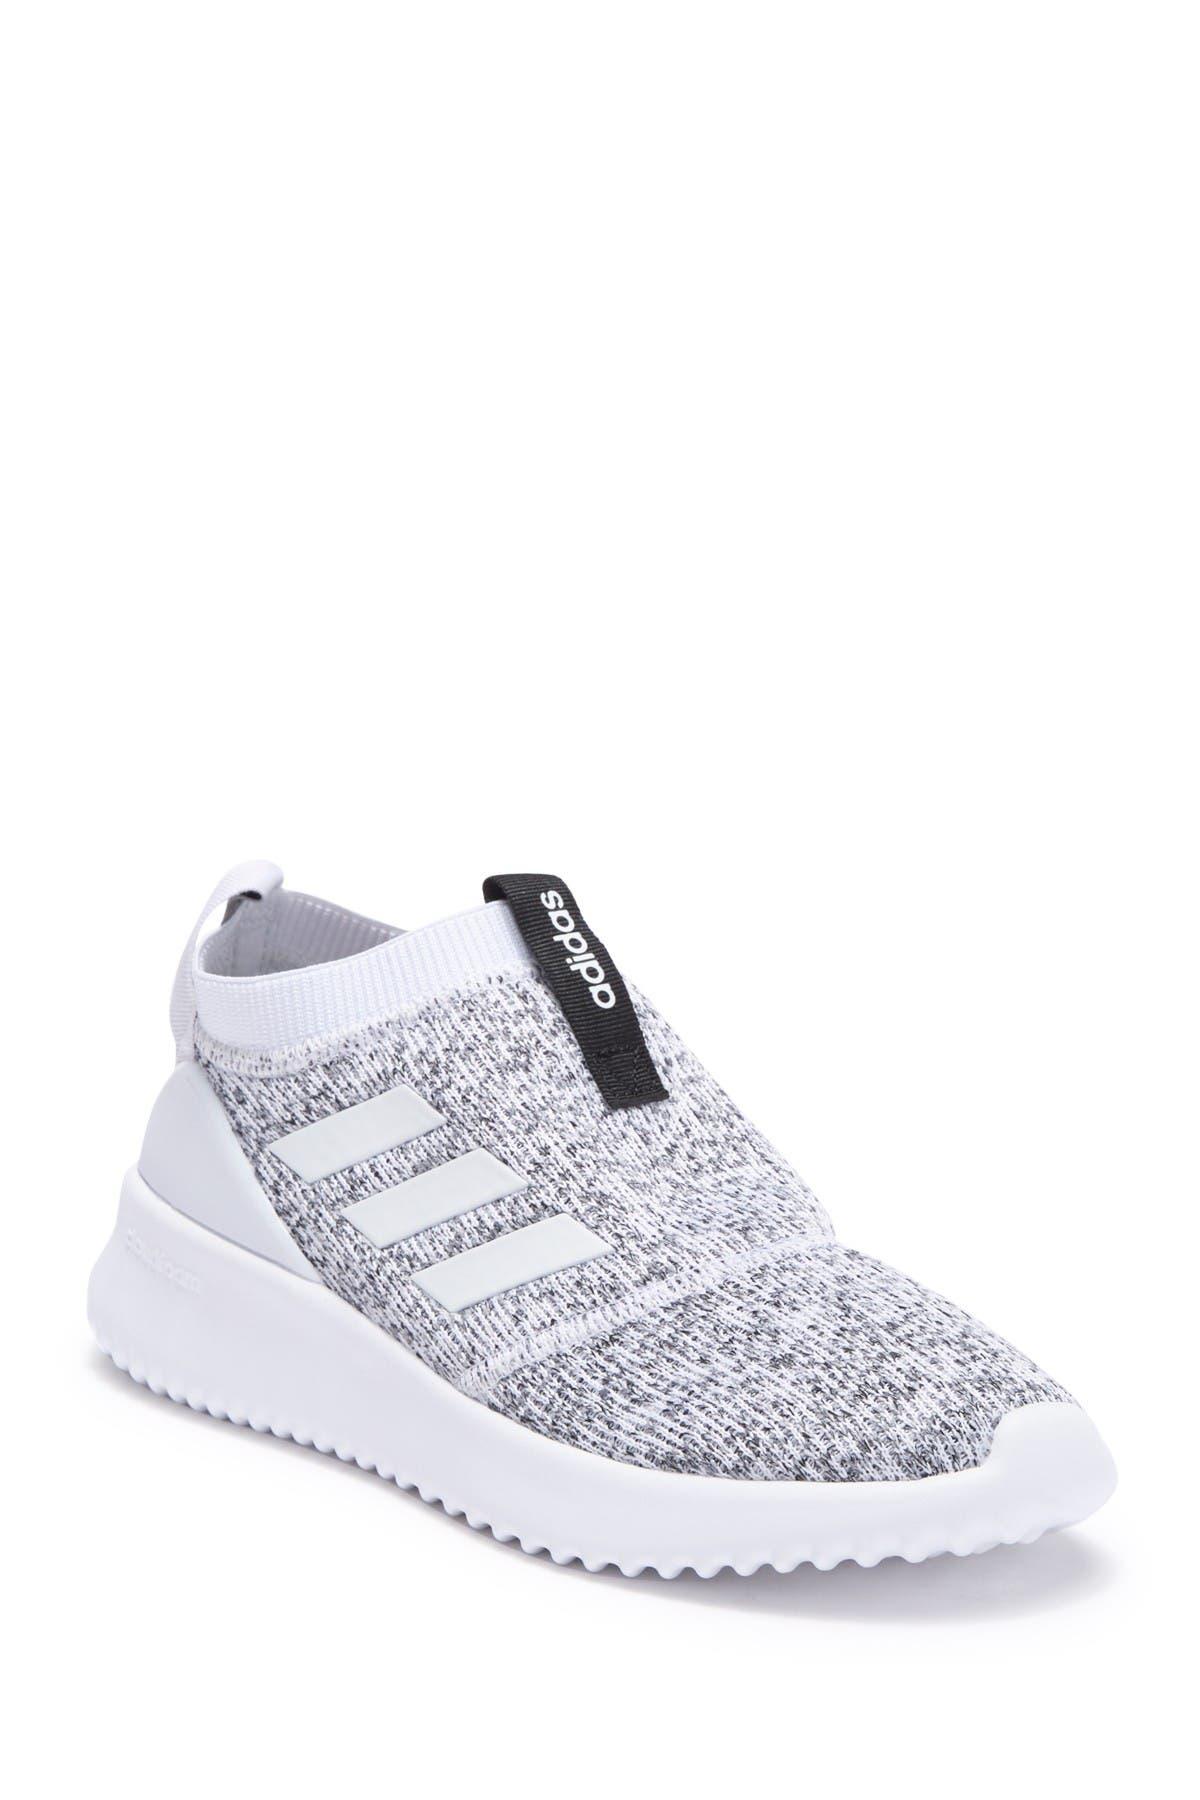 adidas   Ultimafusion Sneaker   HauteLook